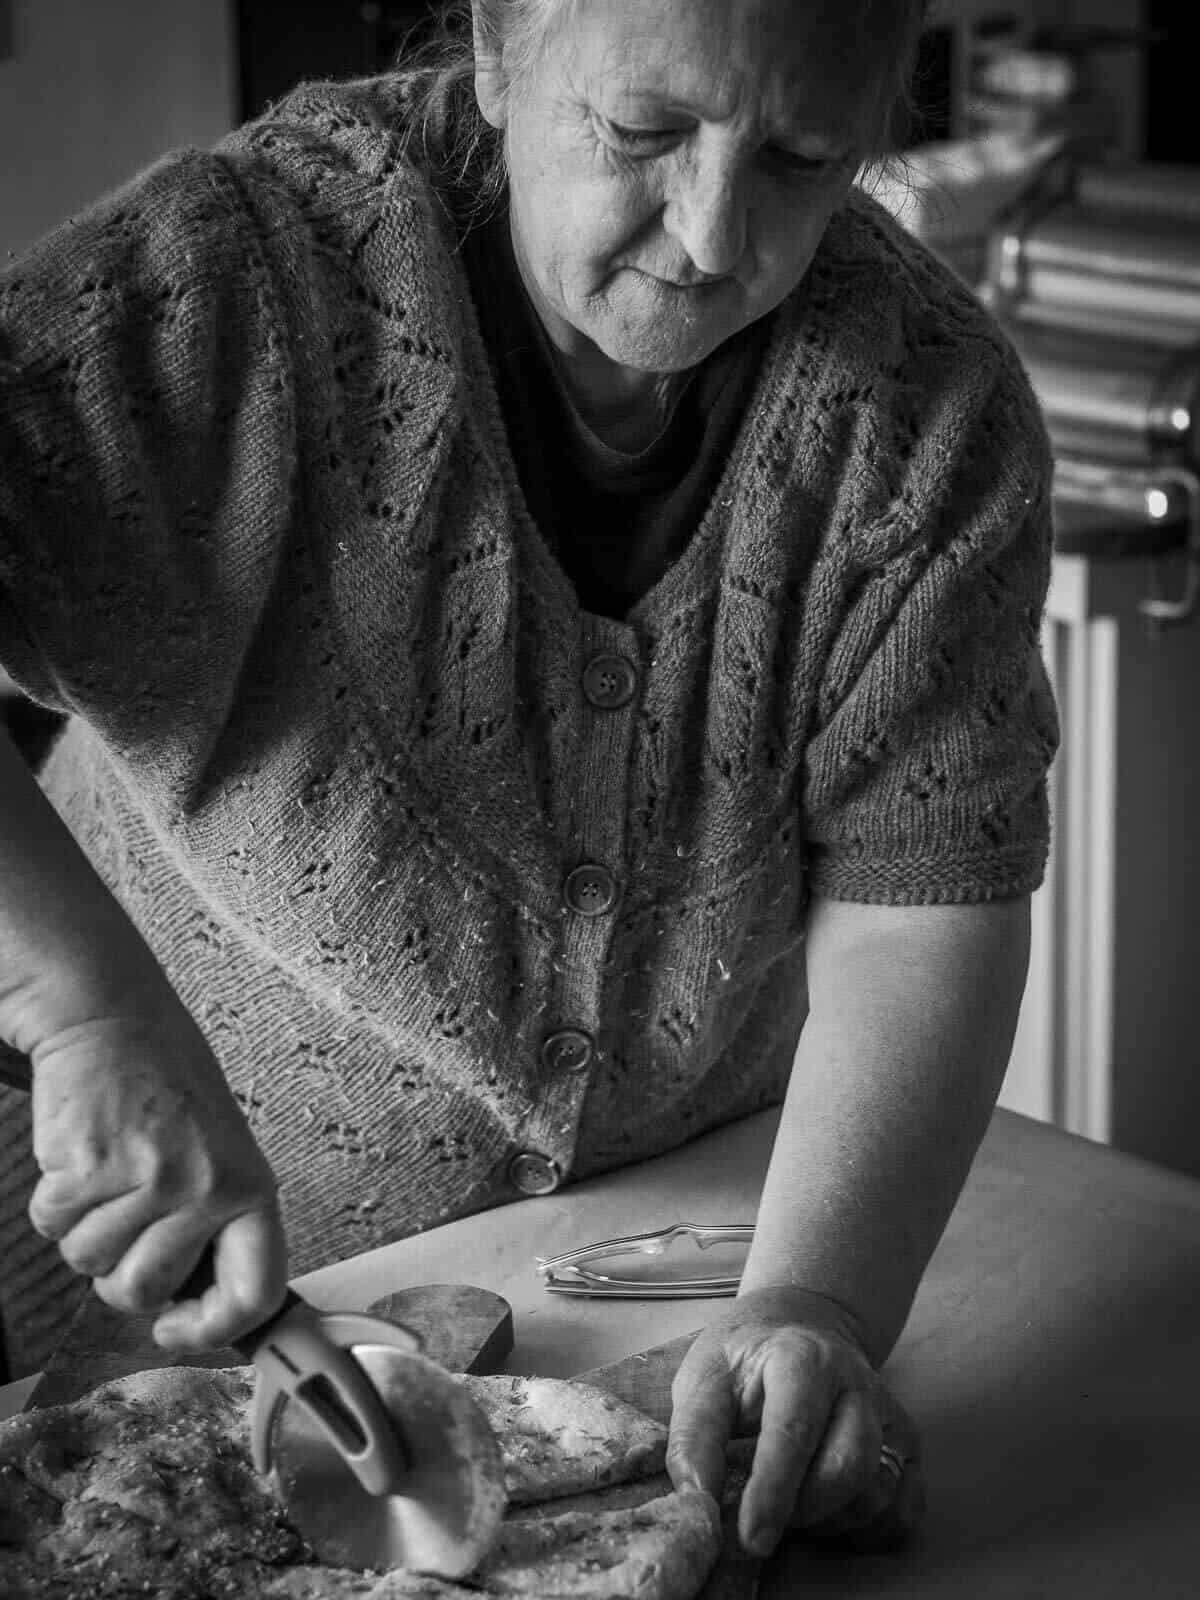 Woman cutting focaccia